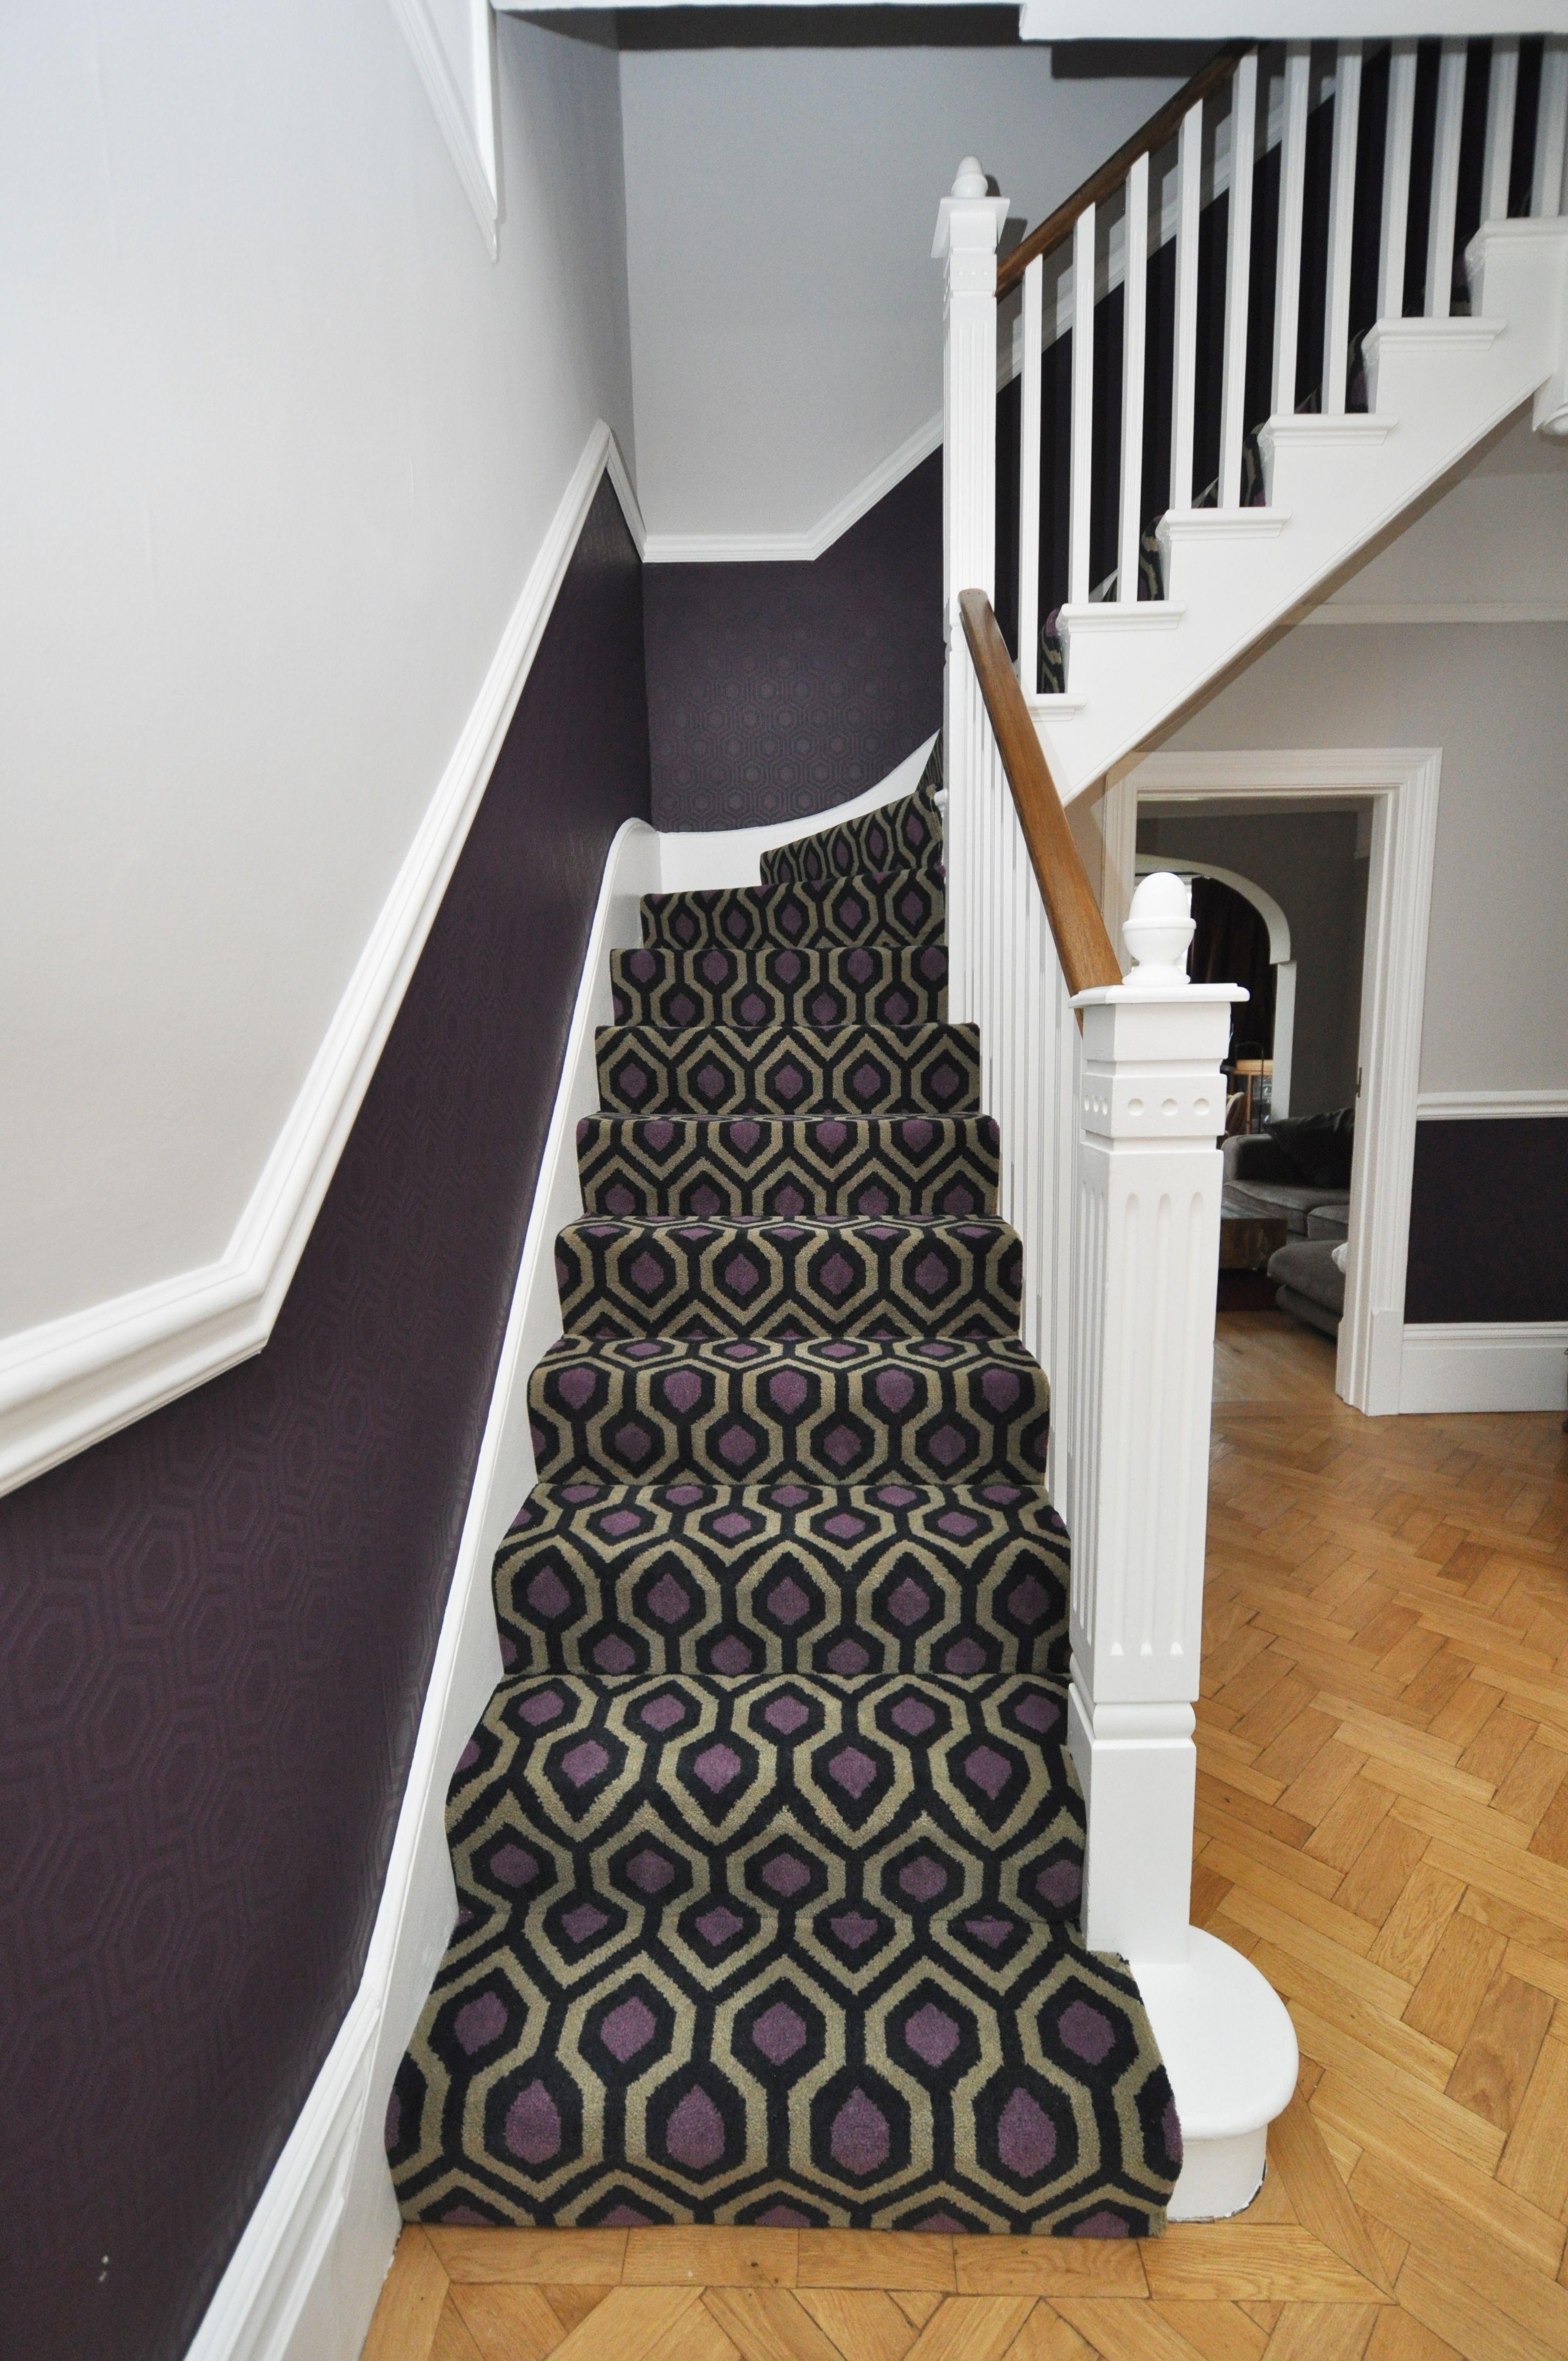 4 085 Geometric Carpet Bowloom Bespoke Geometric Carpet Fitted In Kent Geometric Carpet Carpet Fitting Stair Runner